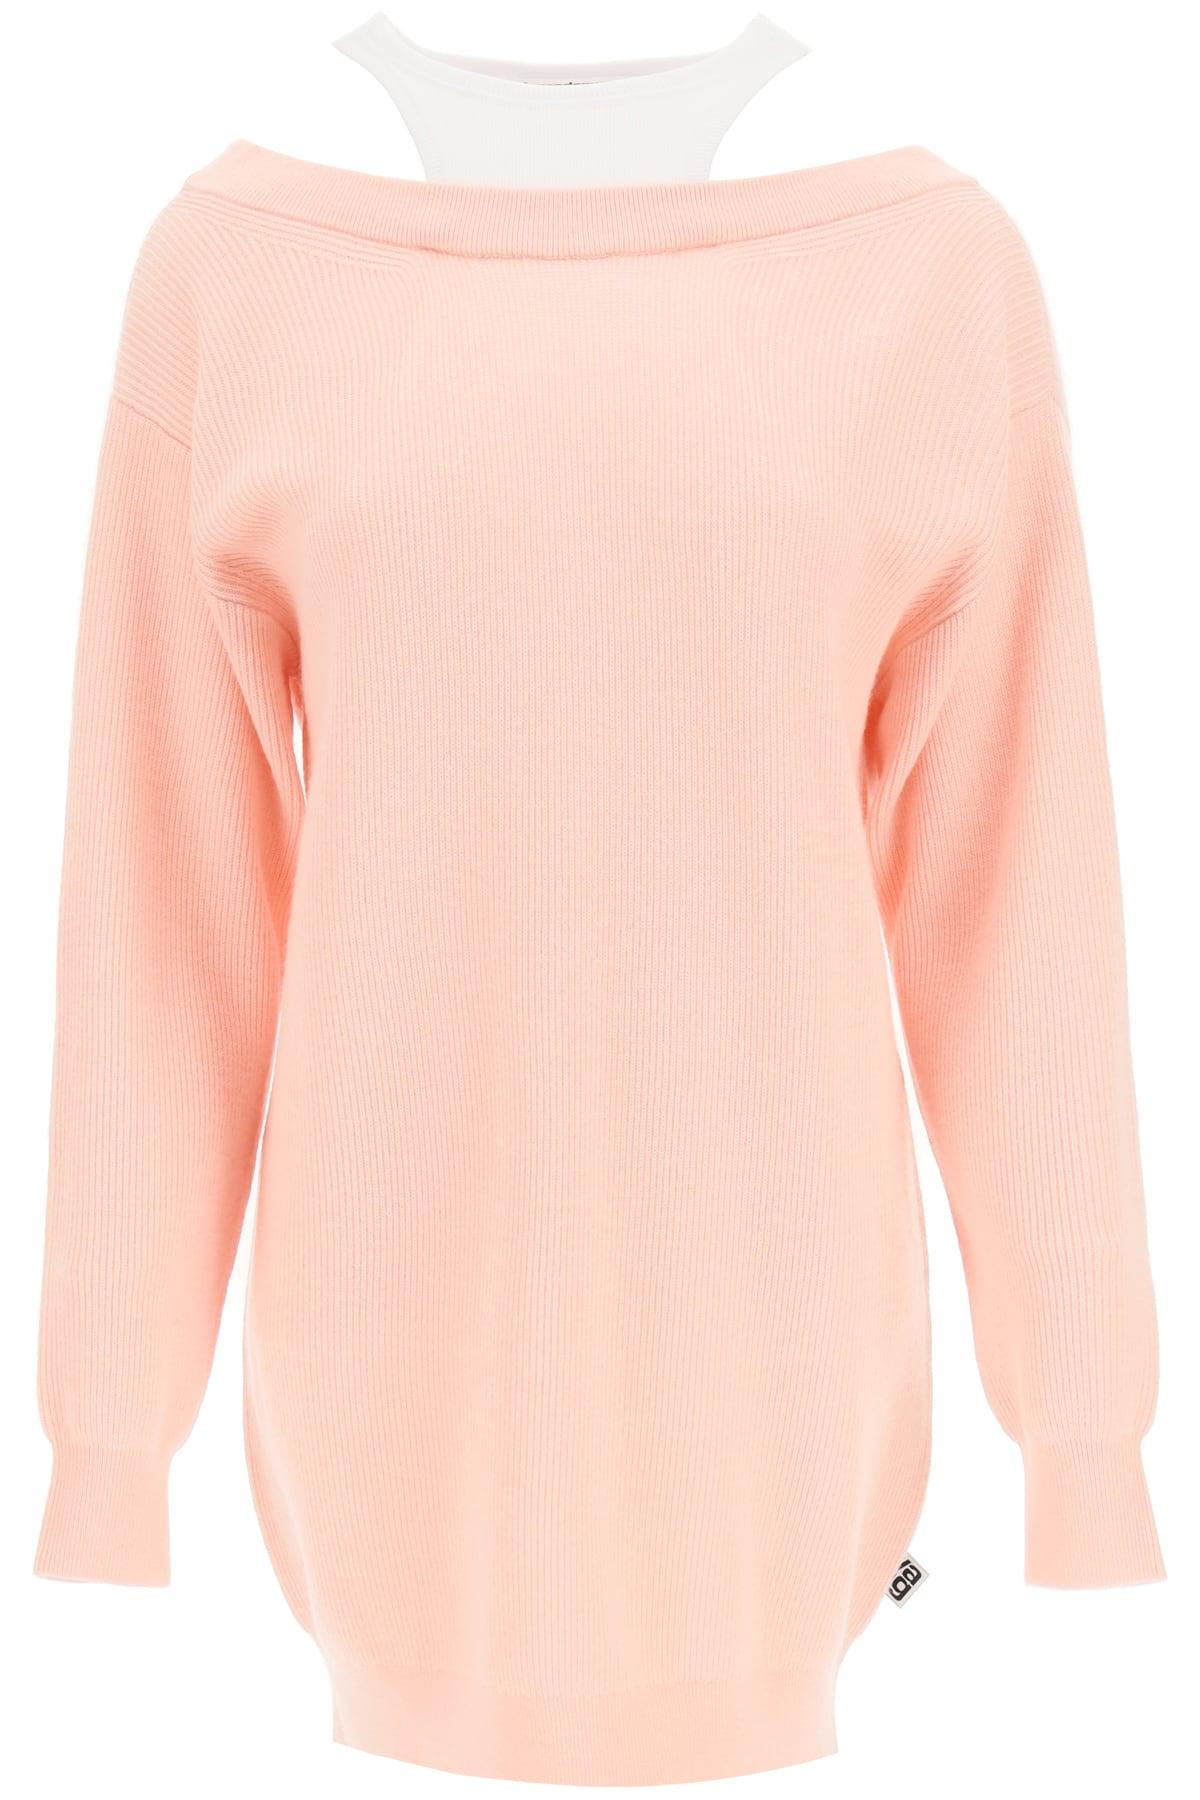 ALEXANDER WANG OFF-SHOULDER WOOL DRESS S Pink, White Wool, Cotton